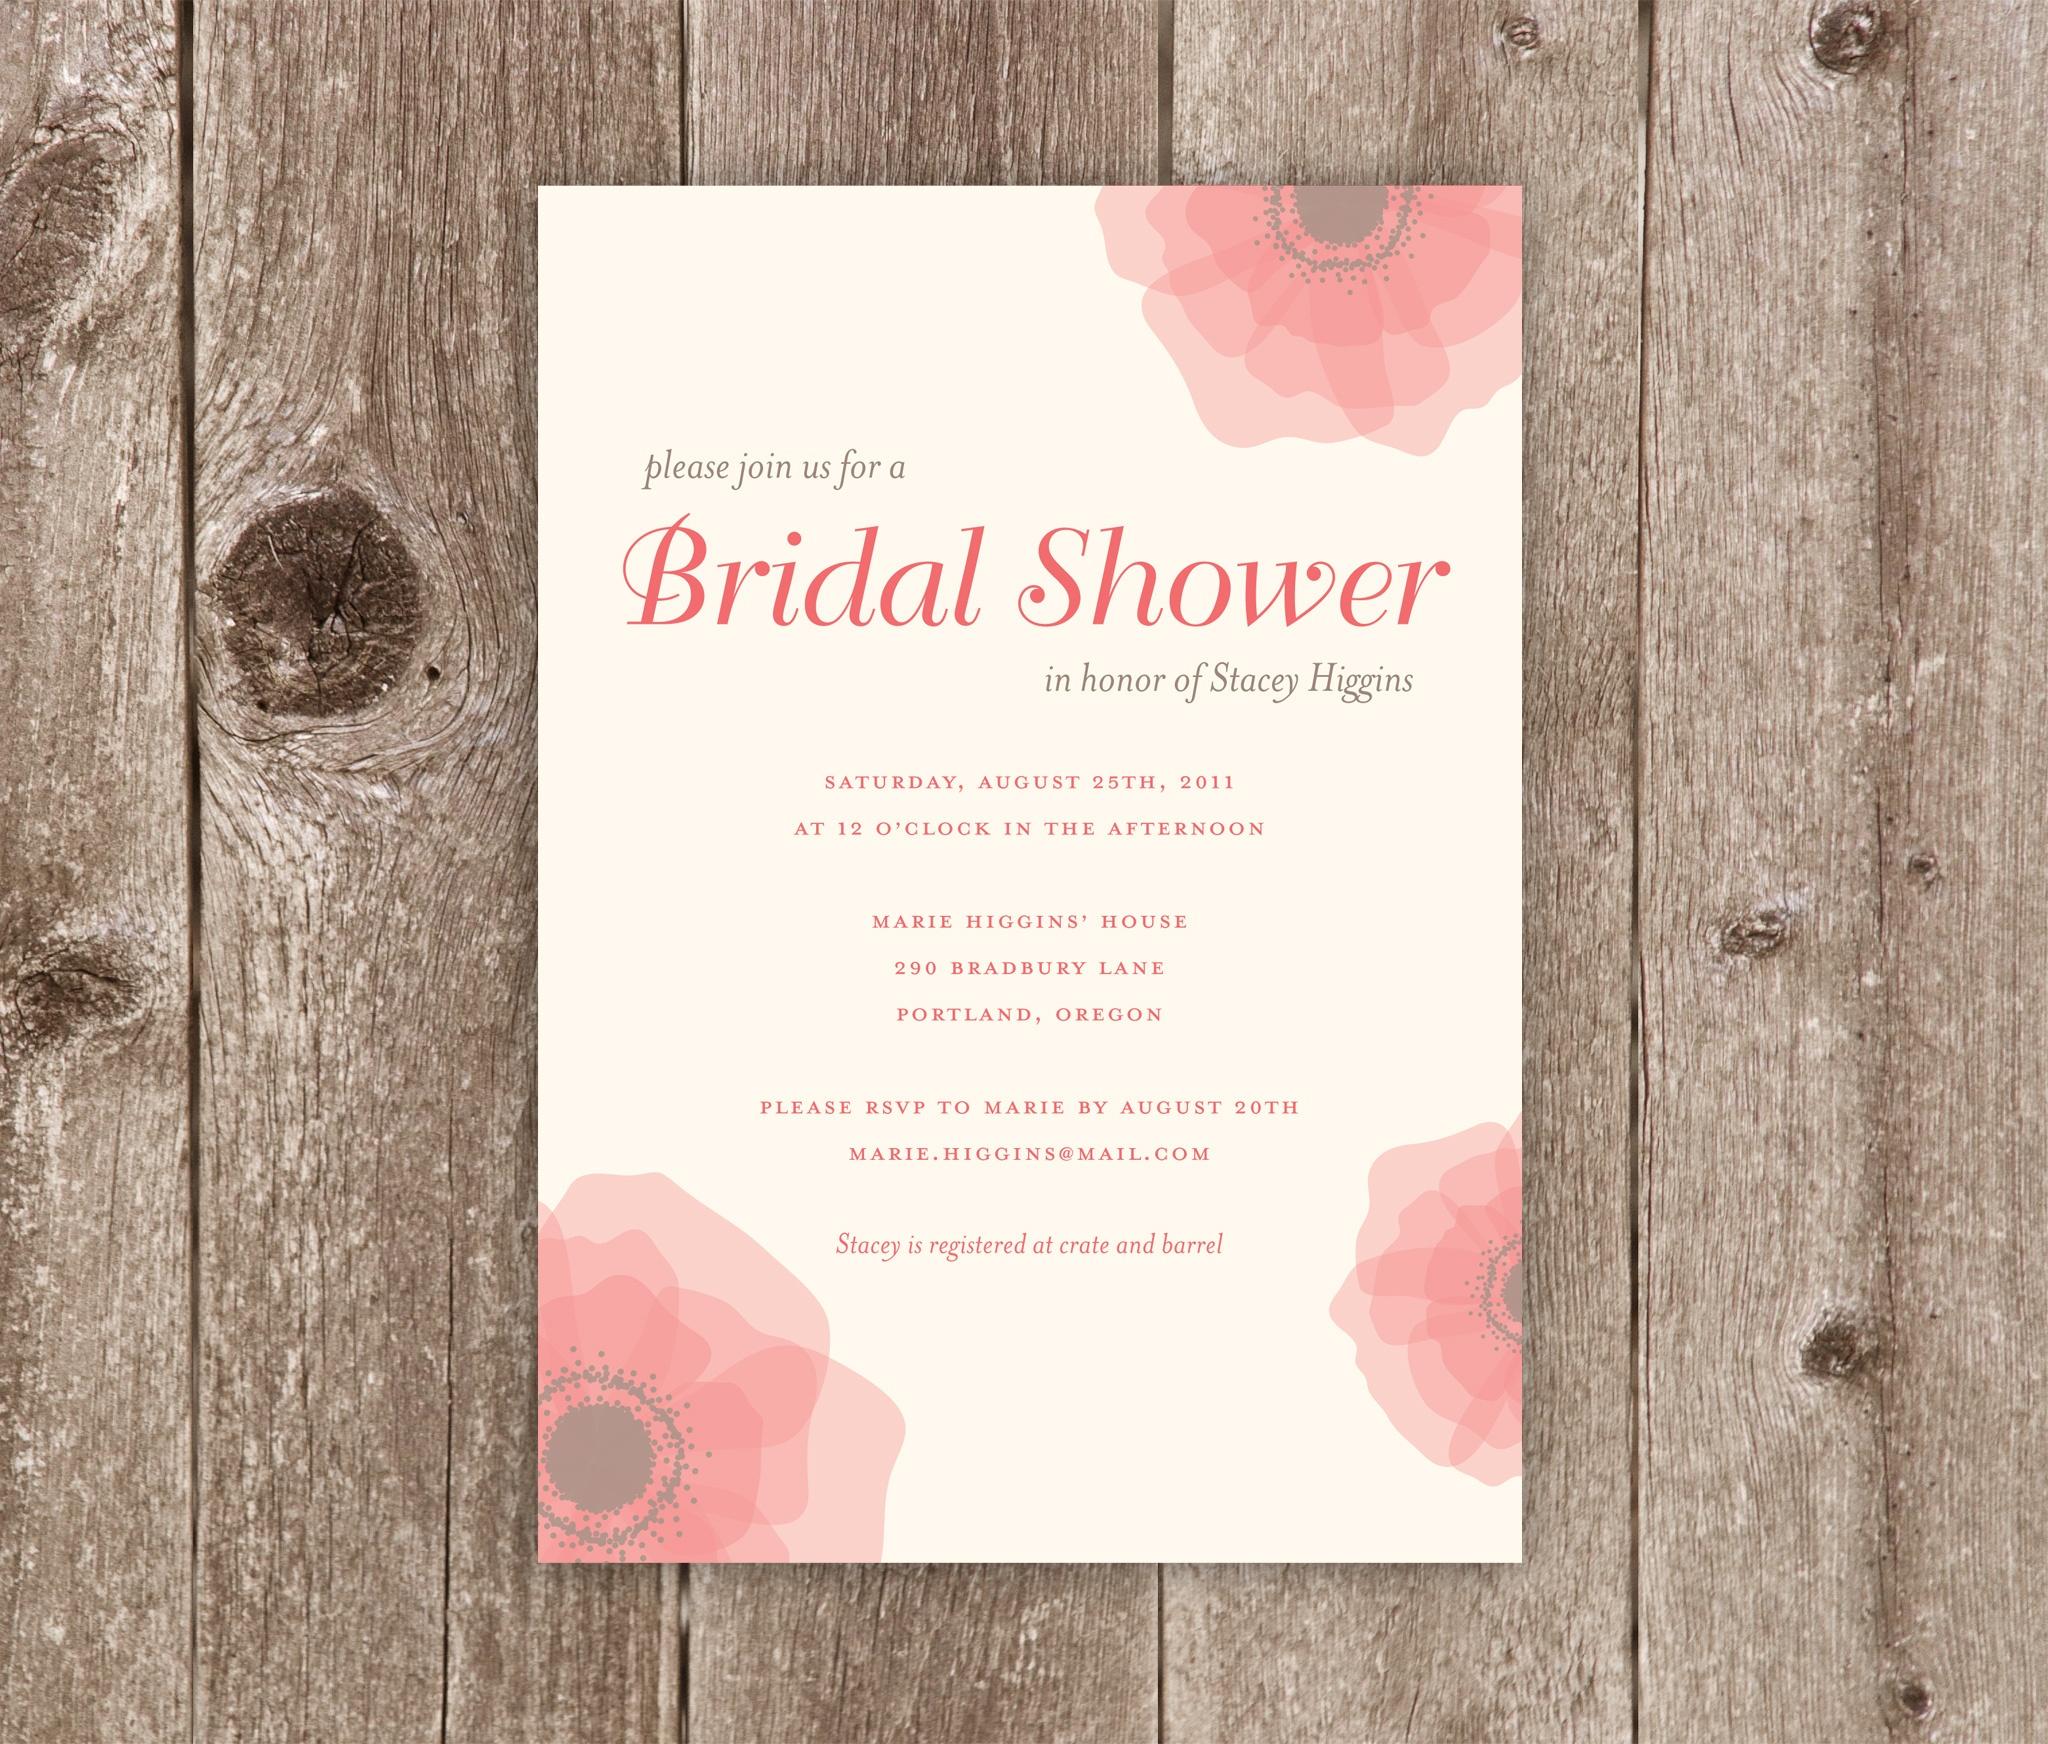 Photo : Printable Beach Bridal Shower Image - Free Printable Beach Theme Bridal Shower Invitations